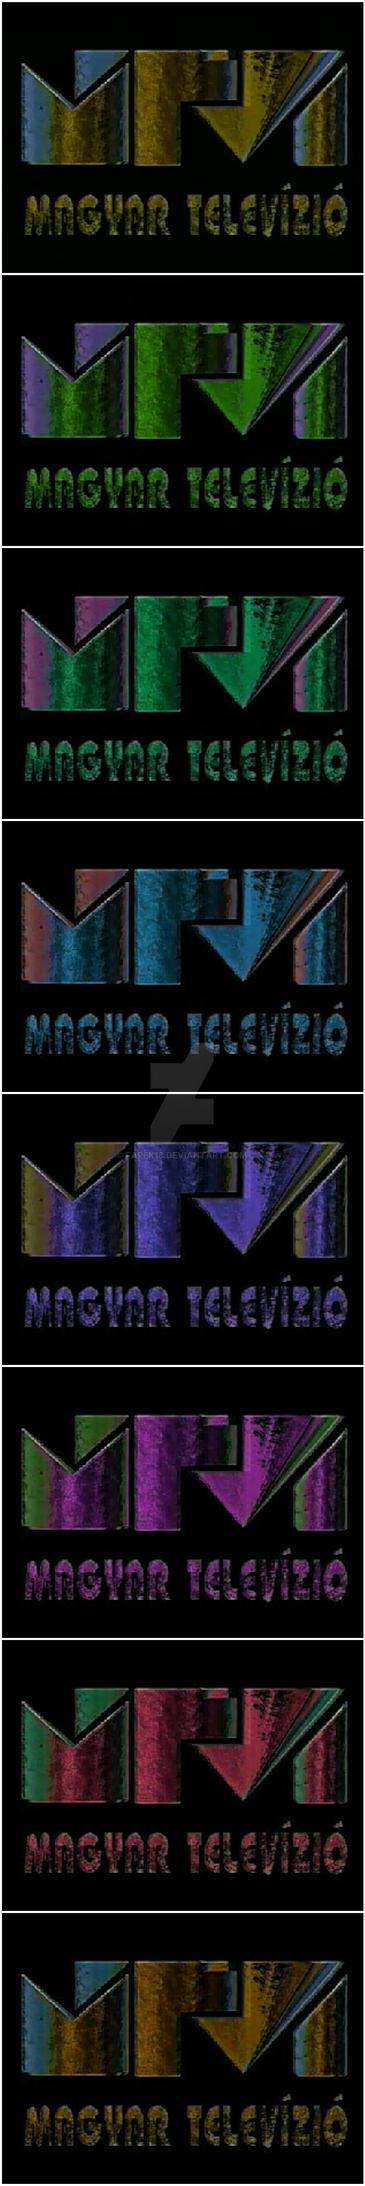 Mtv logo 94 color variation #01 by farek18